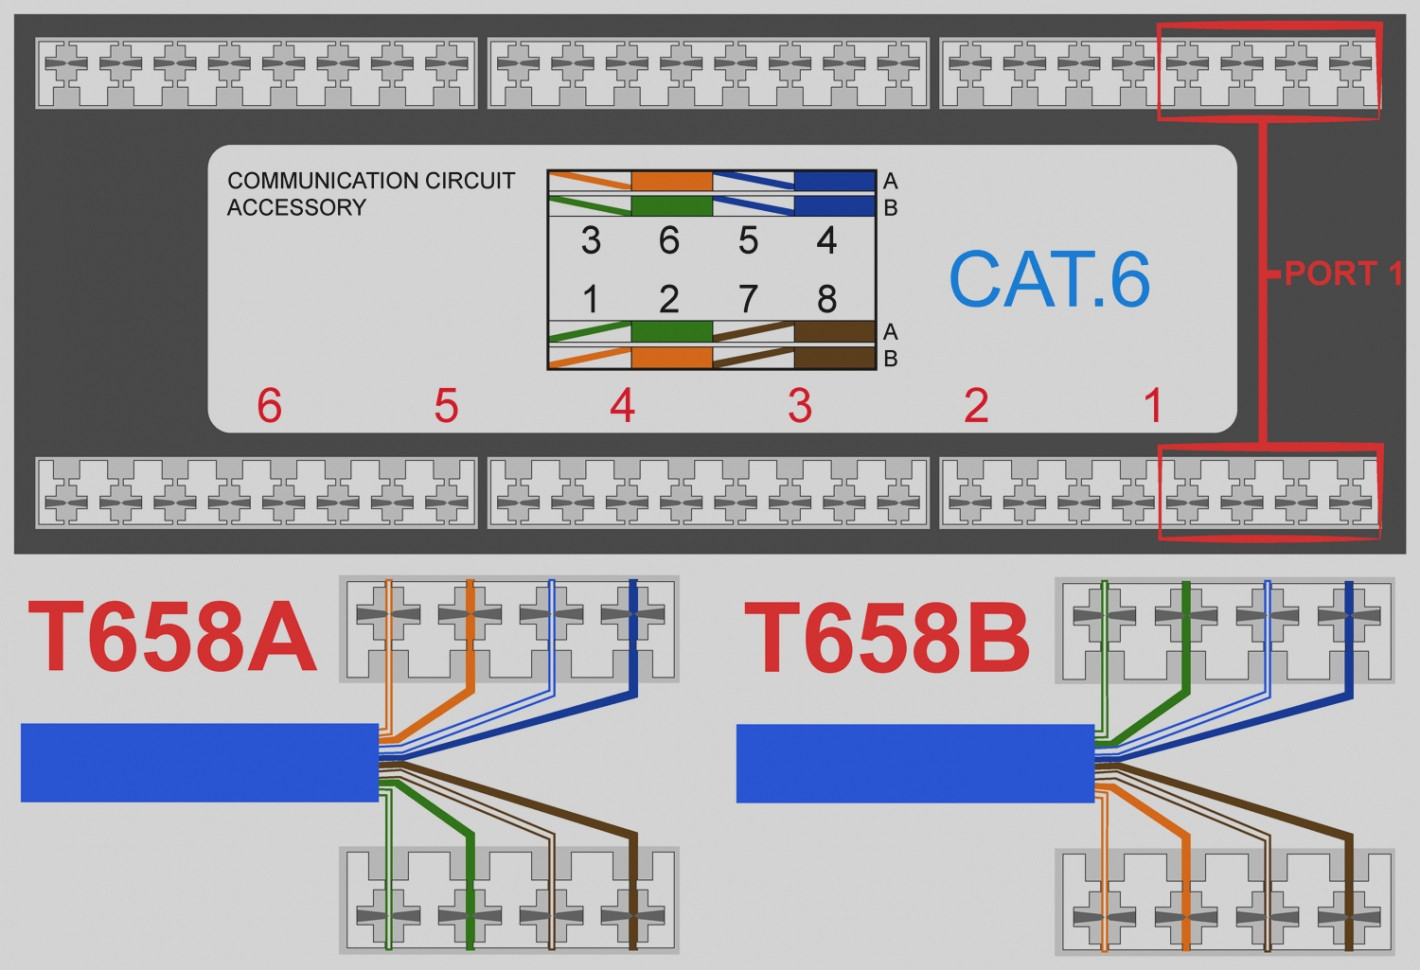 cat 5 wiring diagram a vs b cat 5 wall jack wiring diagram | free wiring diagram belkin cat 5 wiring diagram